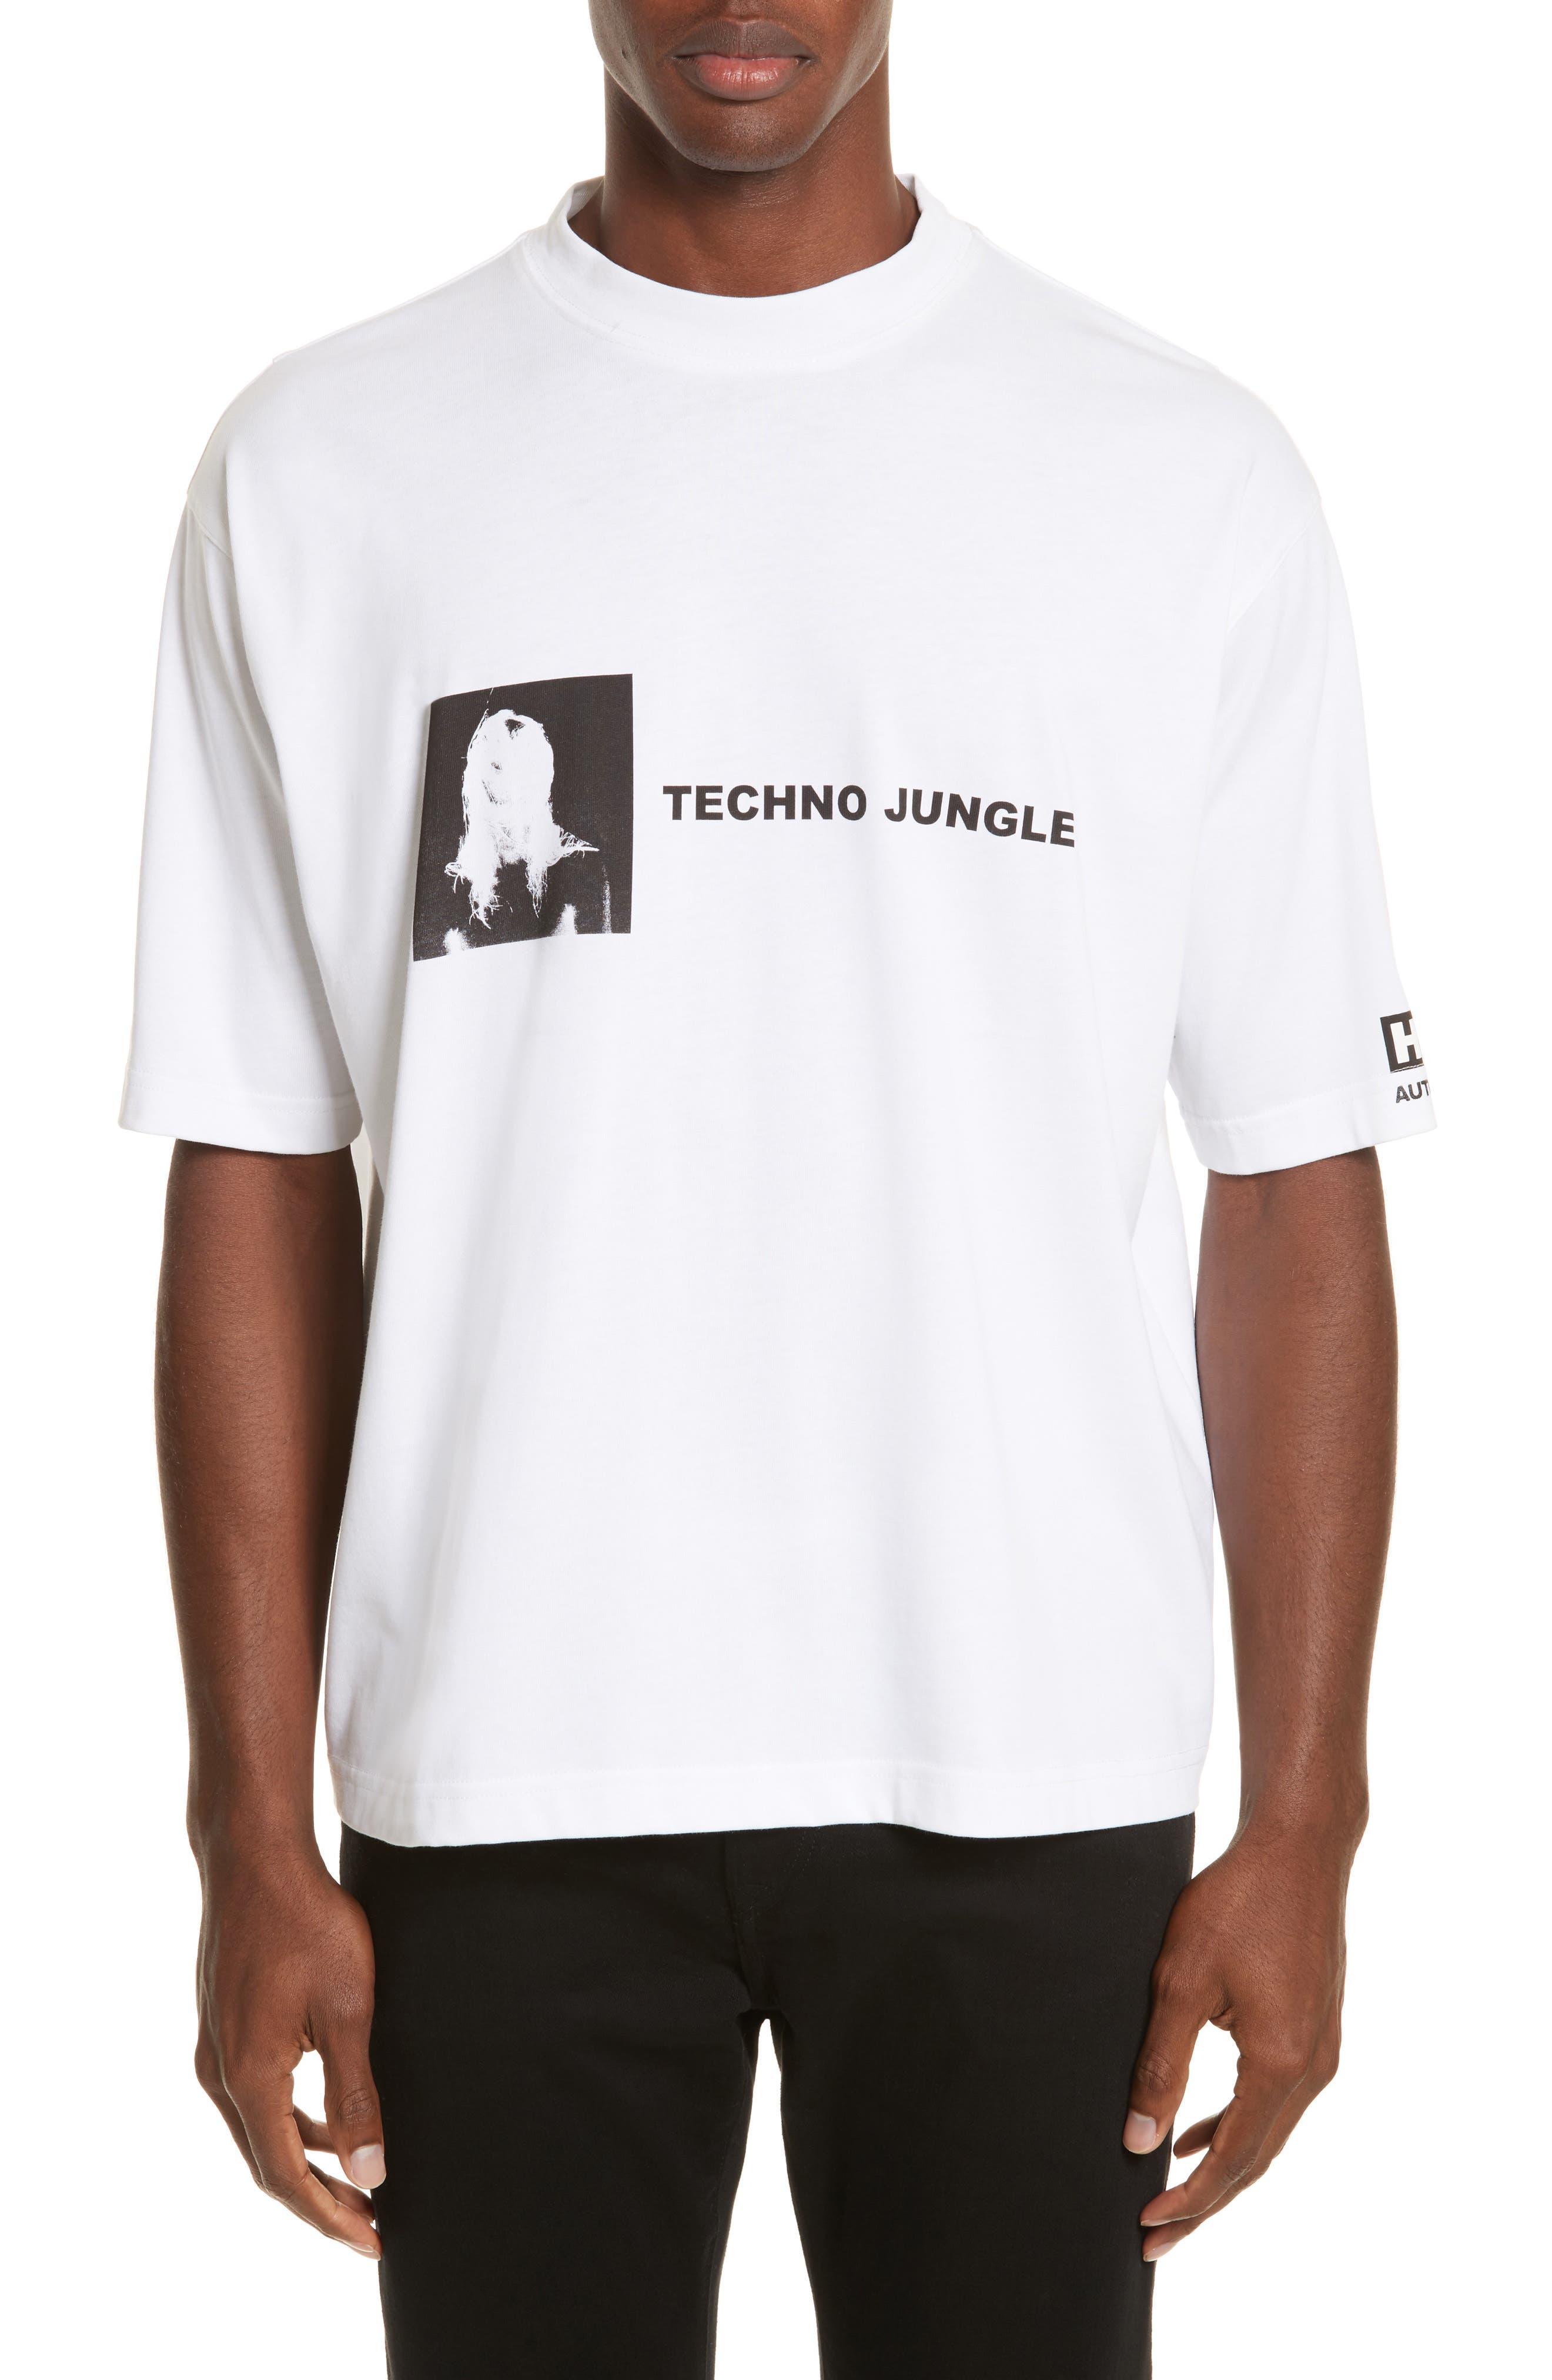 Main Image - Helmut Lang Techno Jungle Graphic T-Shirt